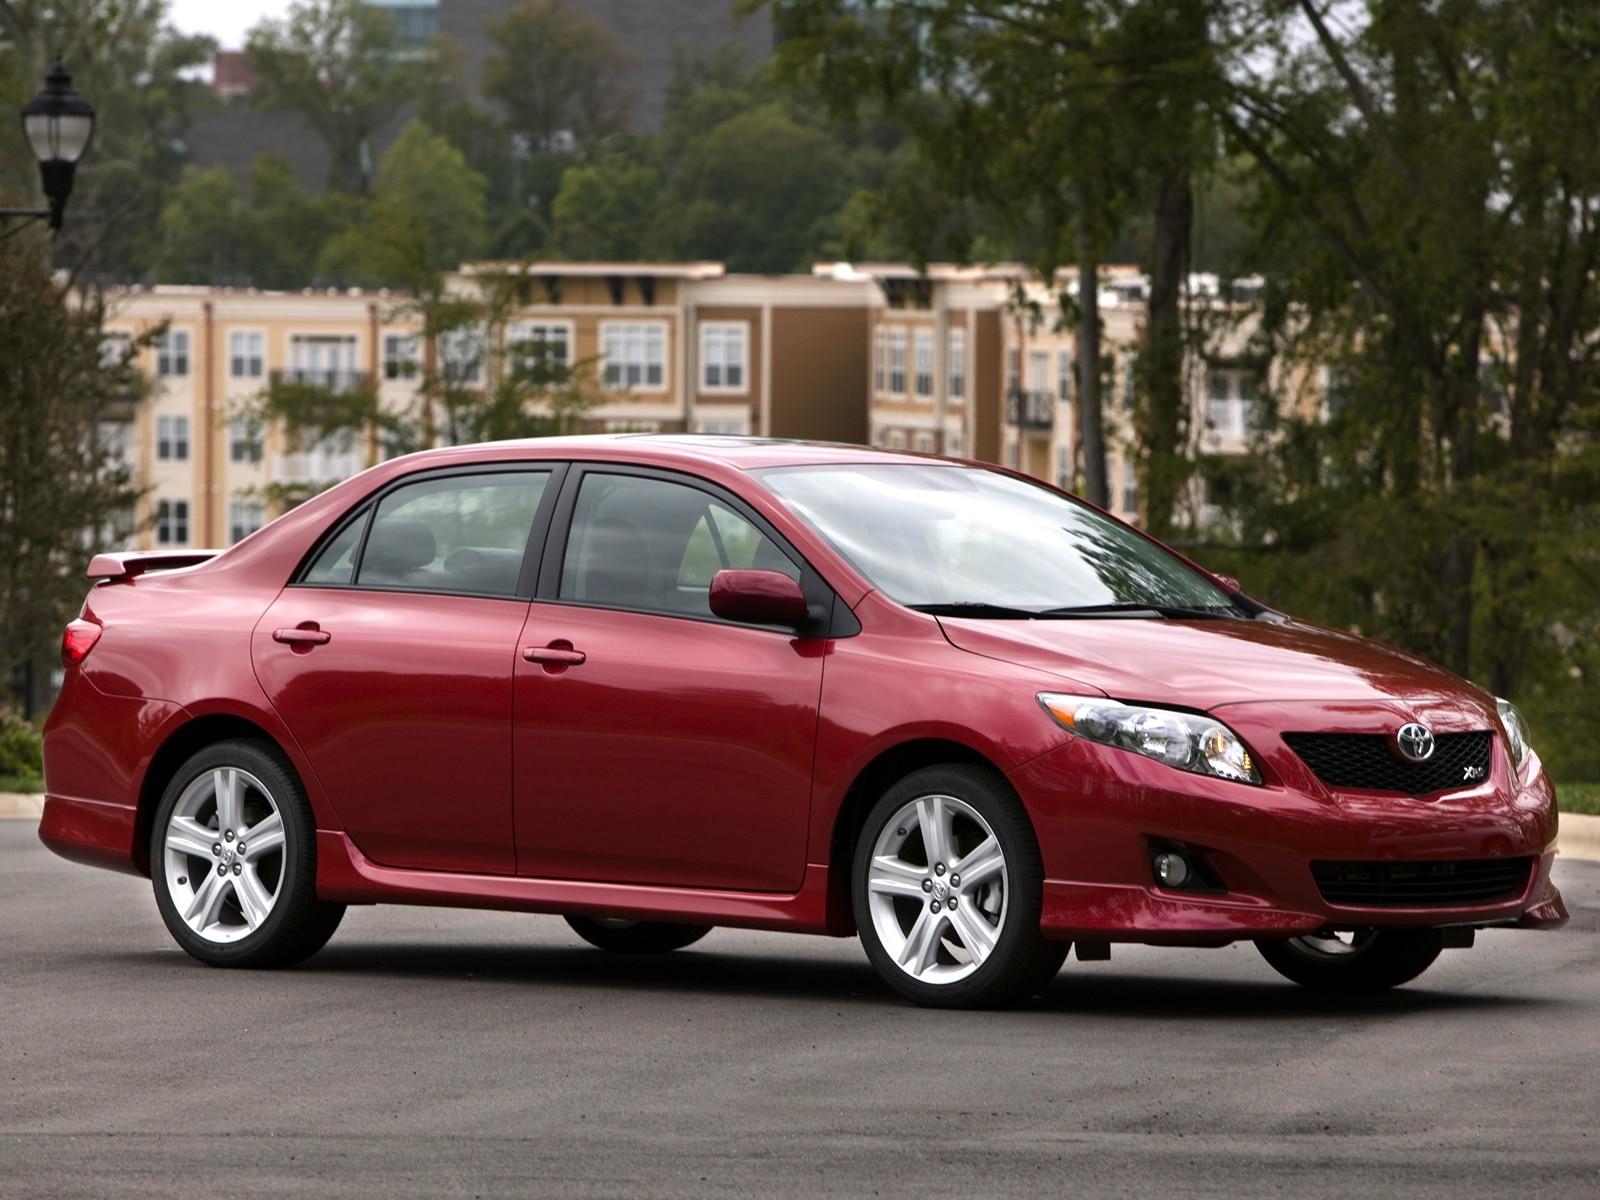 2009 Toyota Corolla XRS - Toyota Sport Sedan Review - Automobile ...